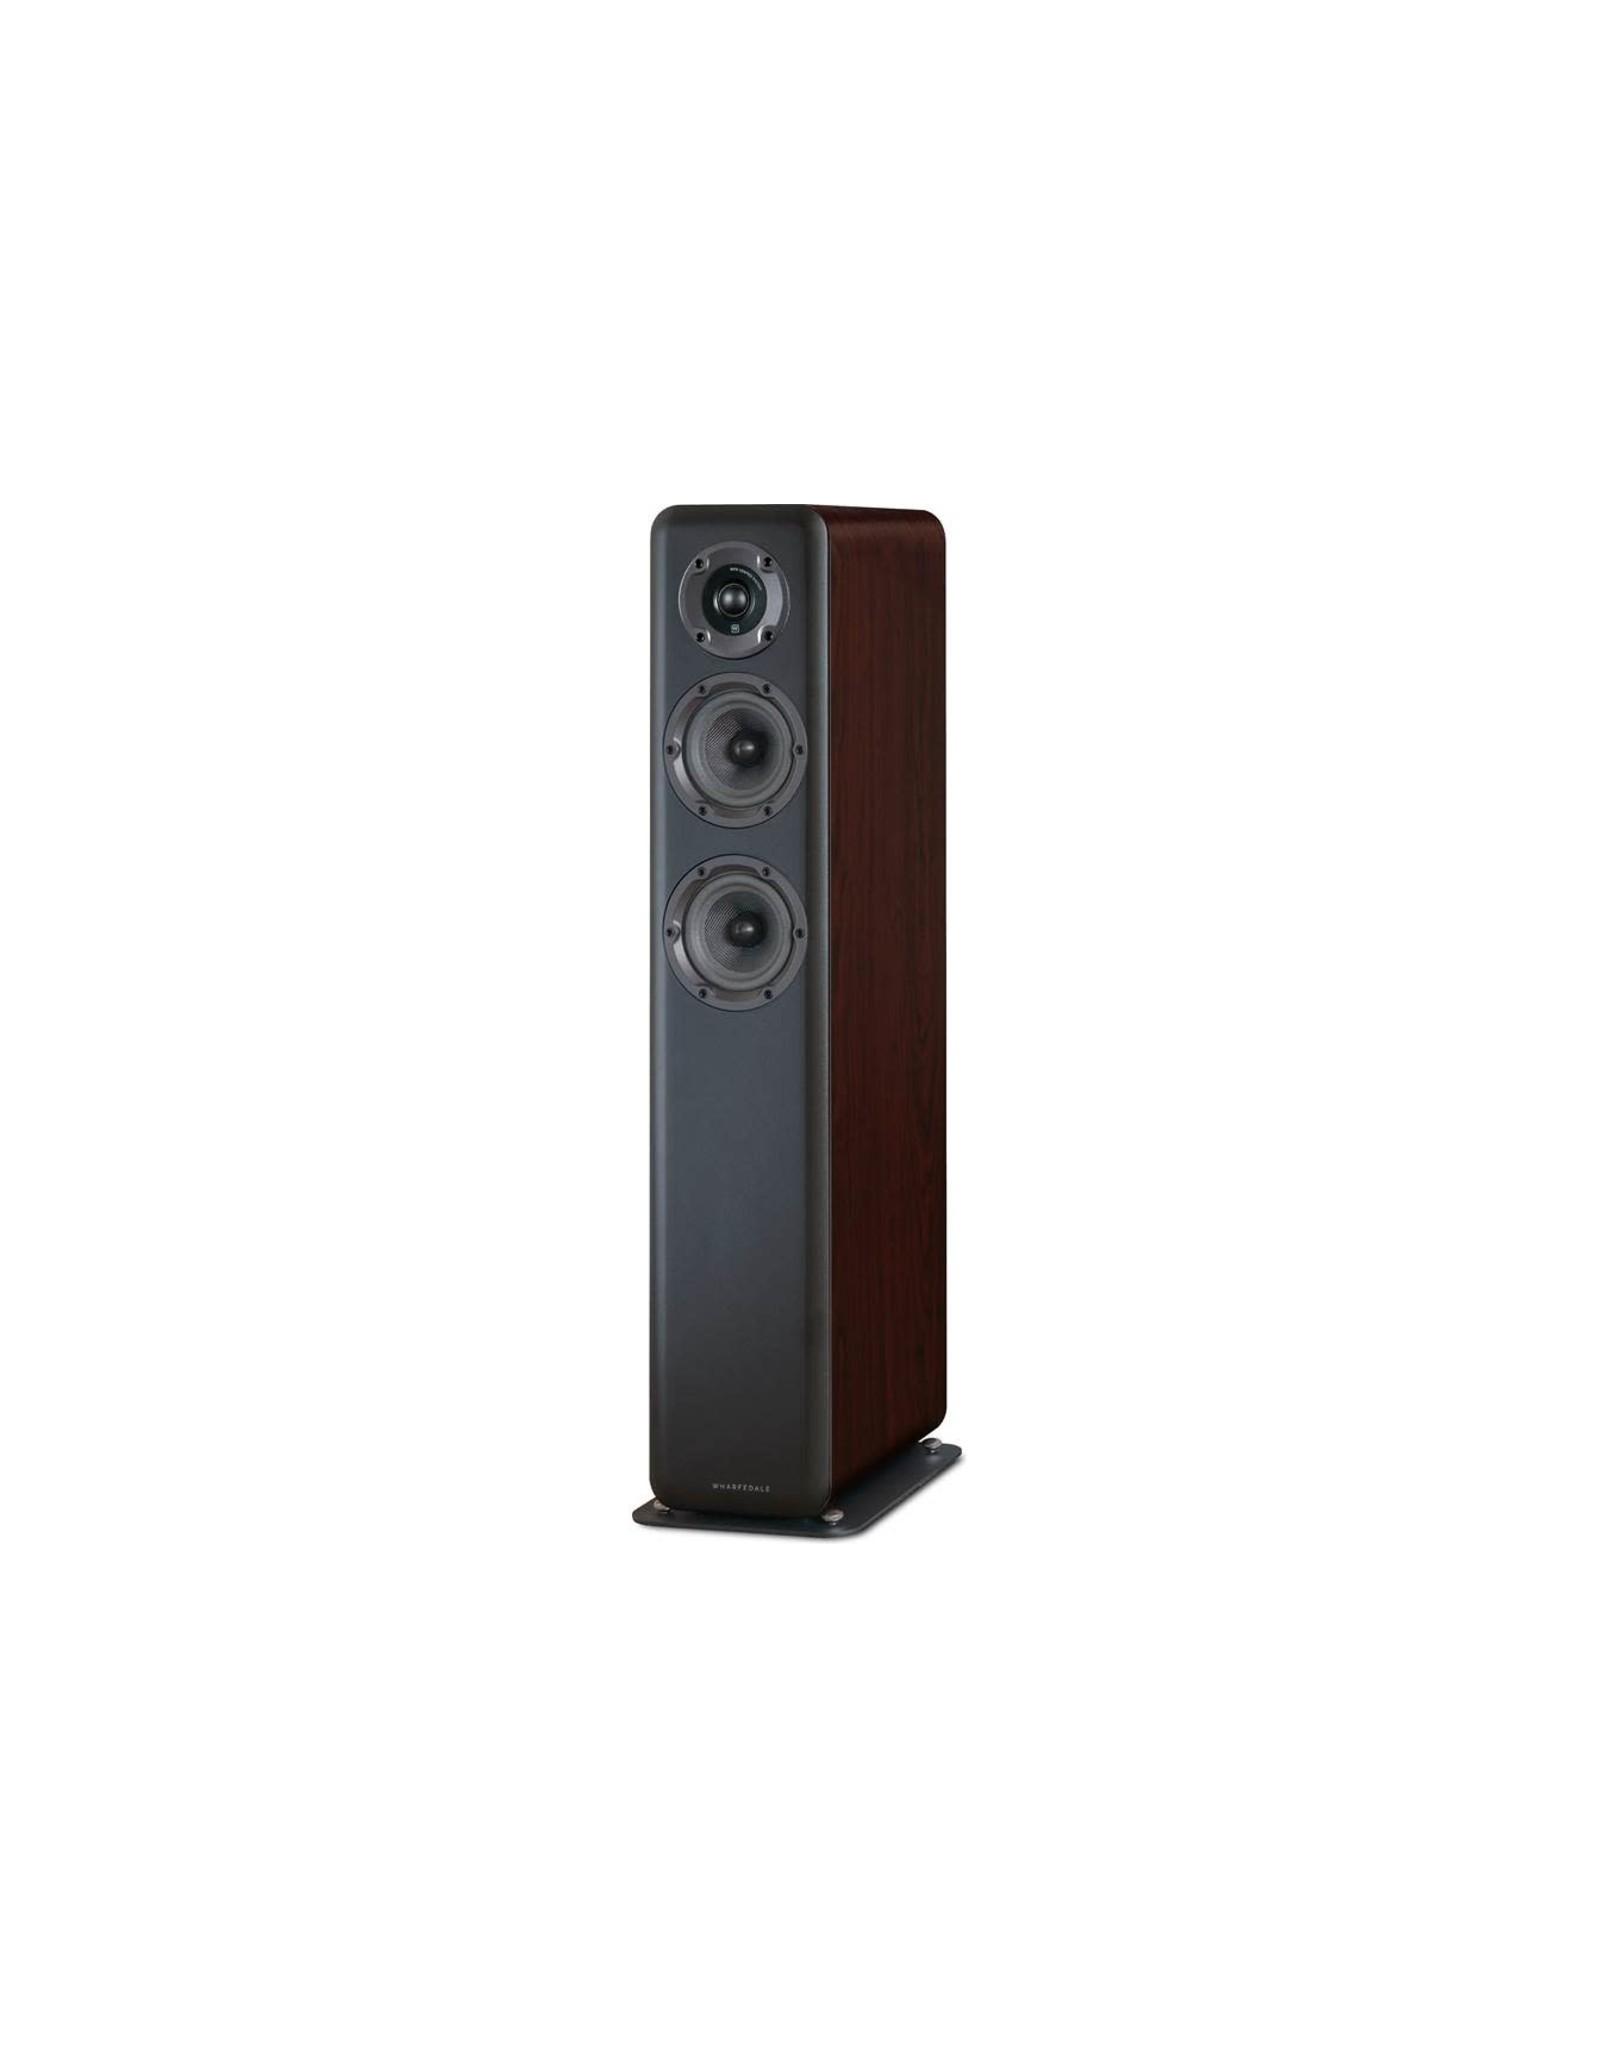 Wharfedale Wharfedale D330 Floorstanding Speakers DISCONTINUED